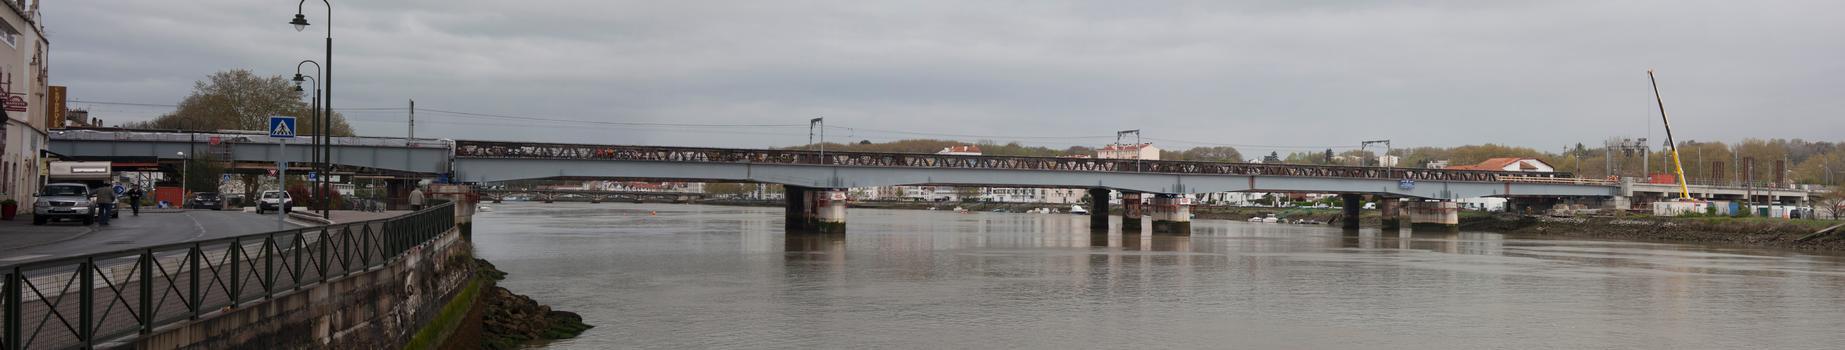 Eisenbahnbrücke Bayonne